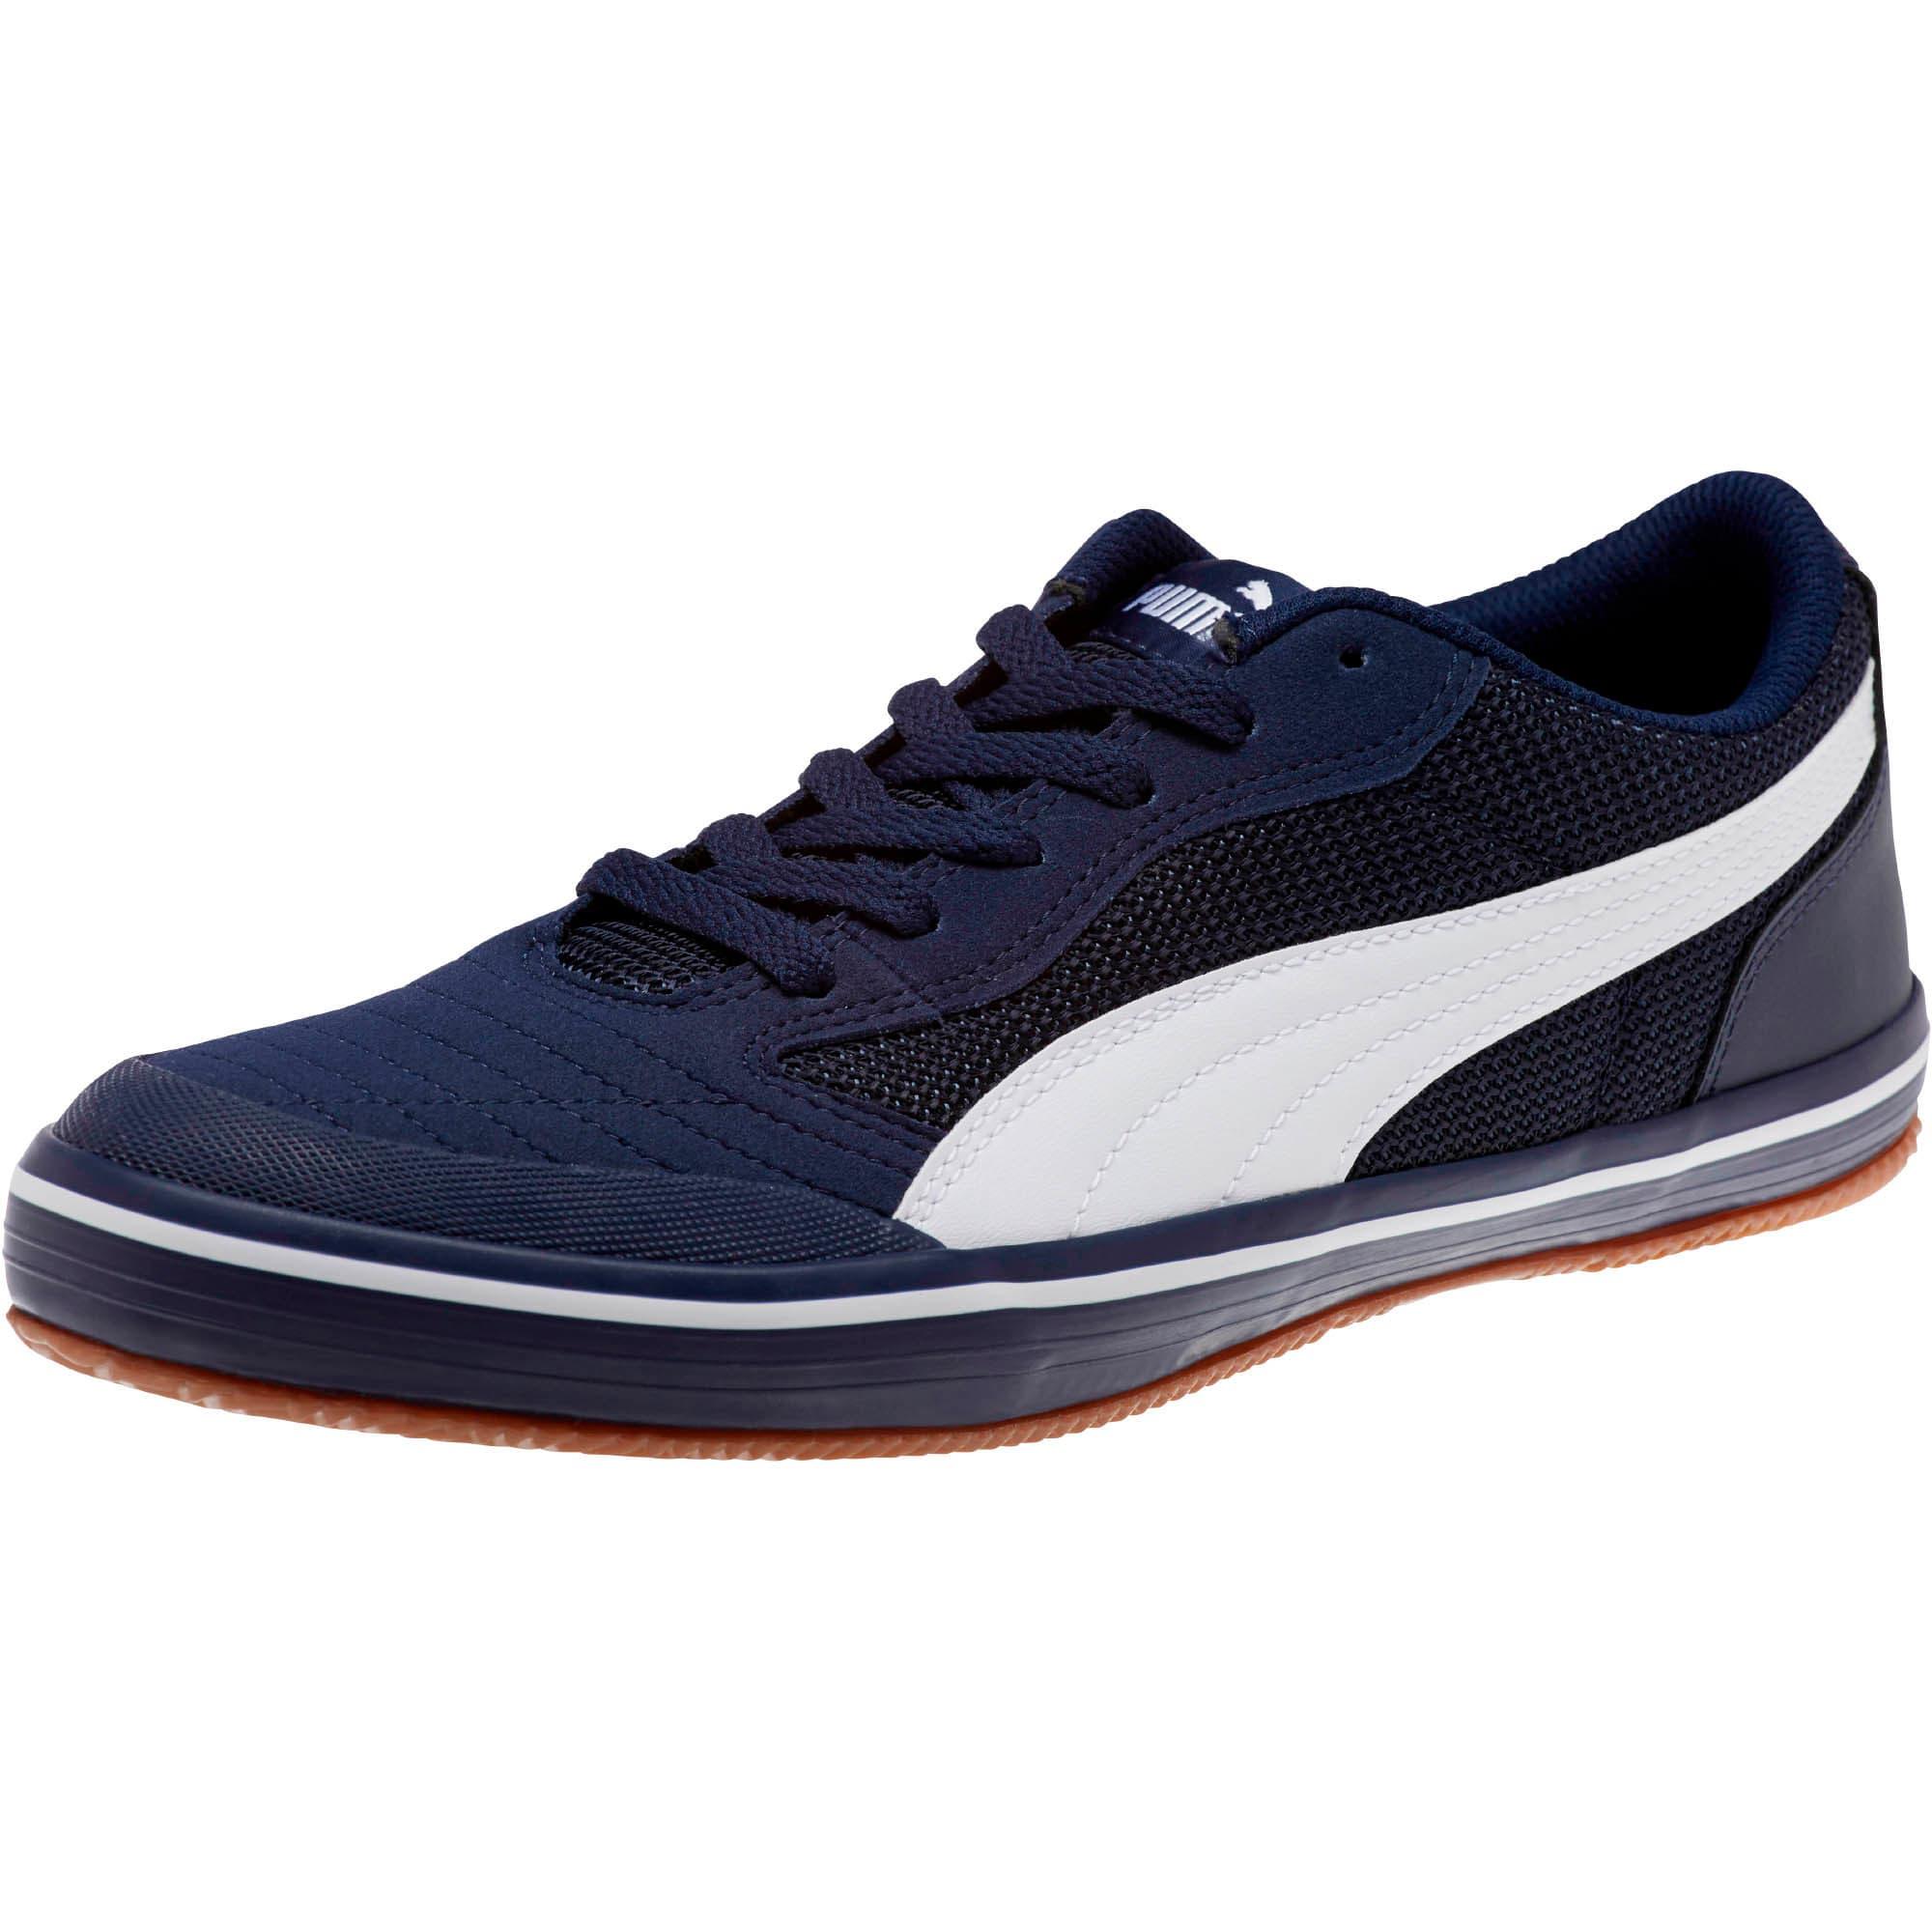 Miniatura 1 de Zapatos deportivos Astro Sala para hombre, Peacoat-Puma White, mediano